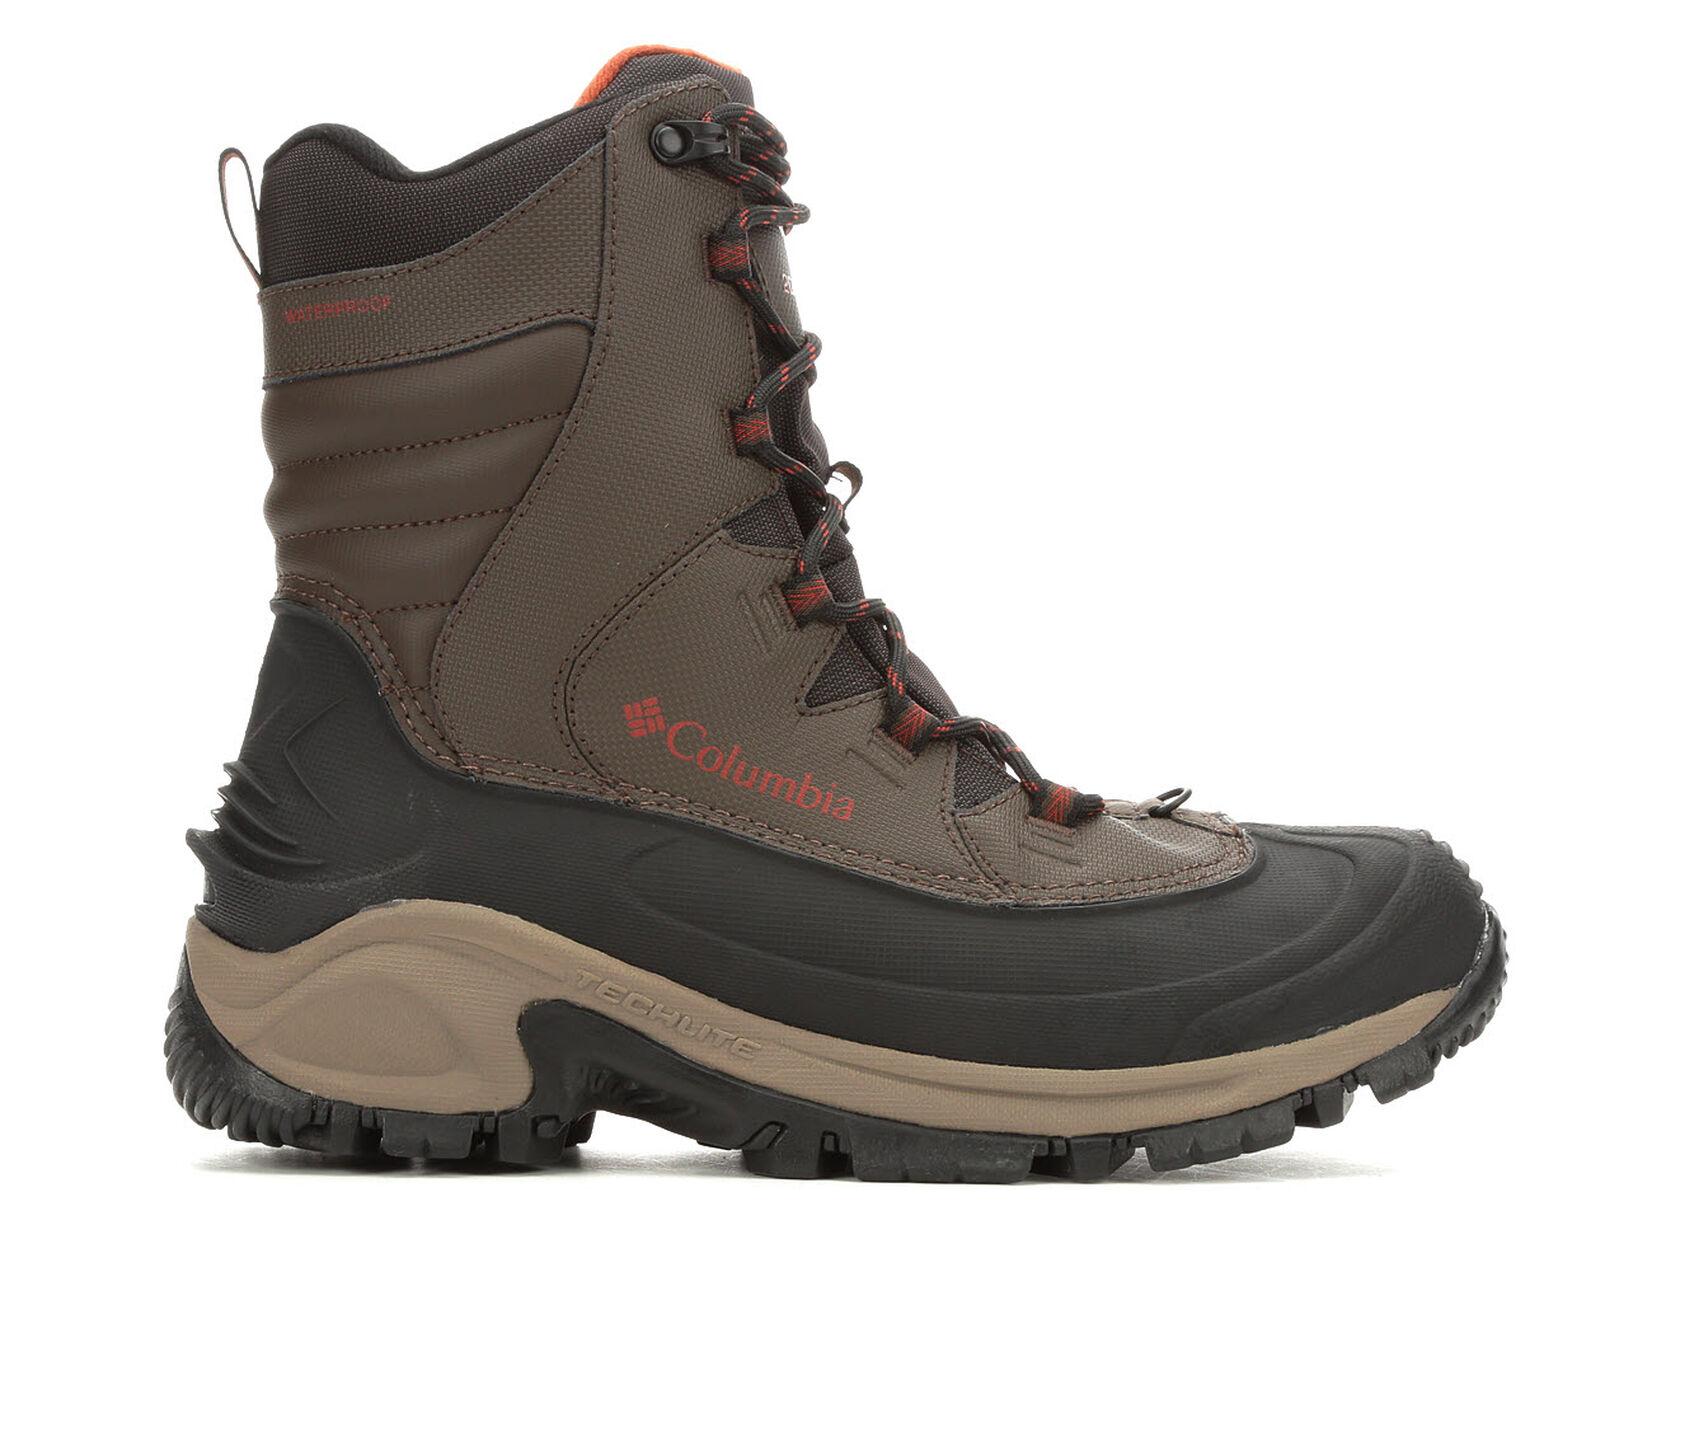 9a906c3ef0f Men's Columbia Bugaboot III Winter Boots